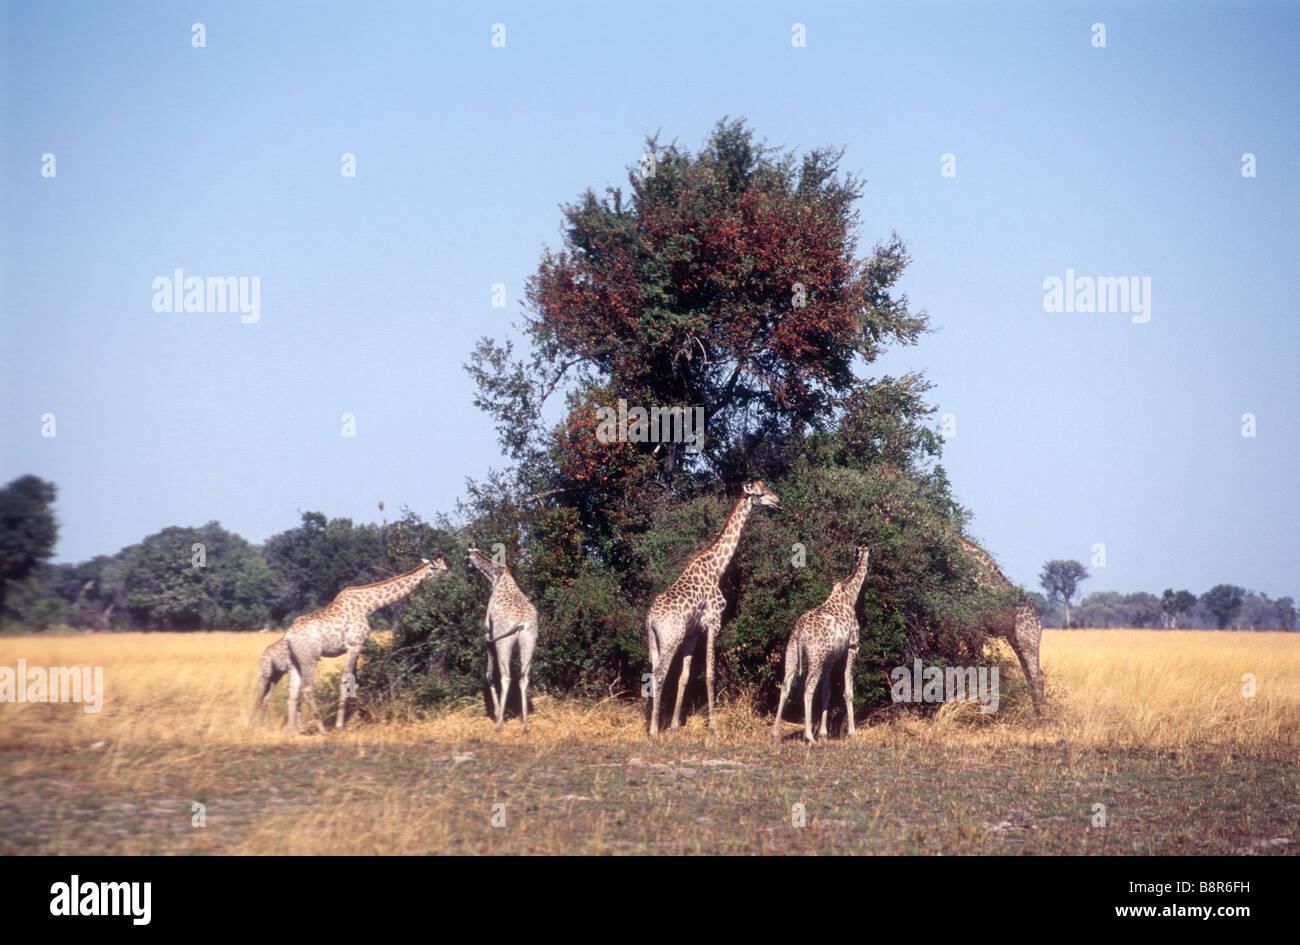 Giraffe browsing on large trees Stock Photo